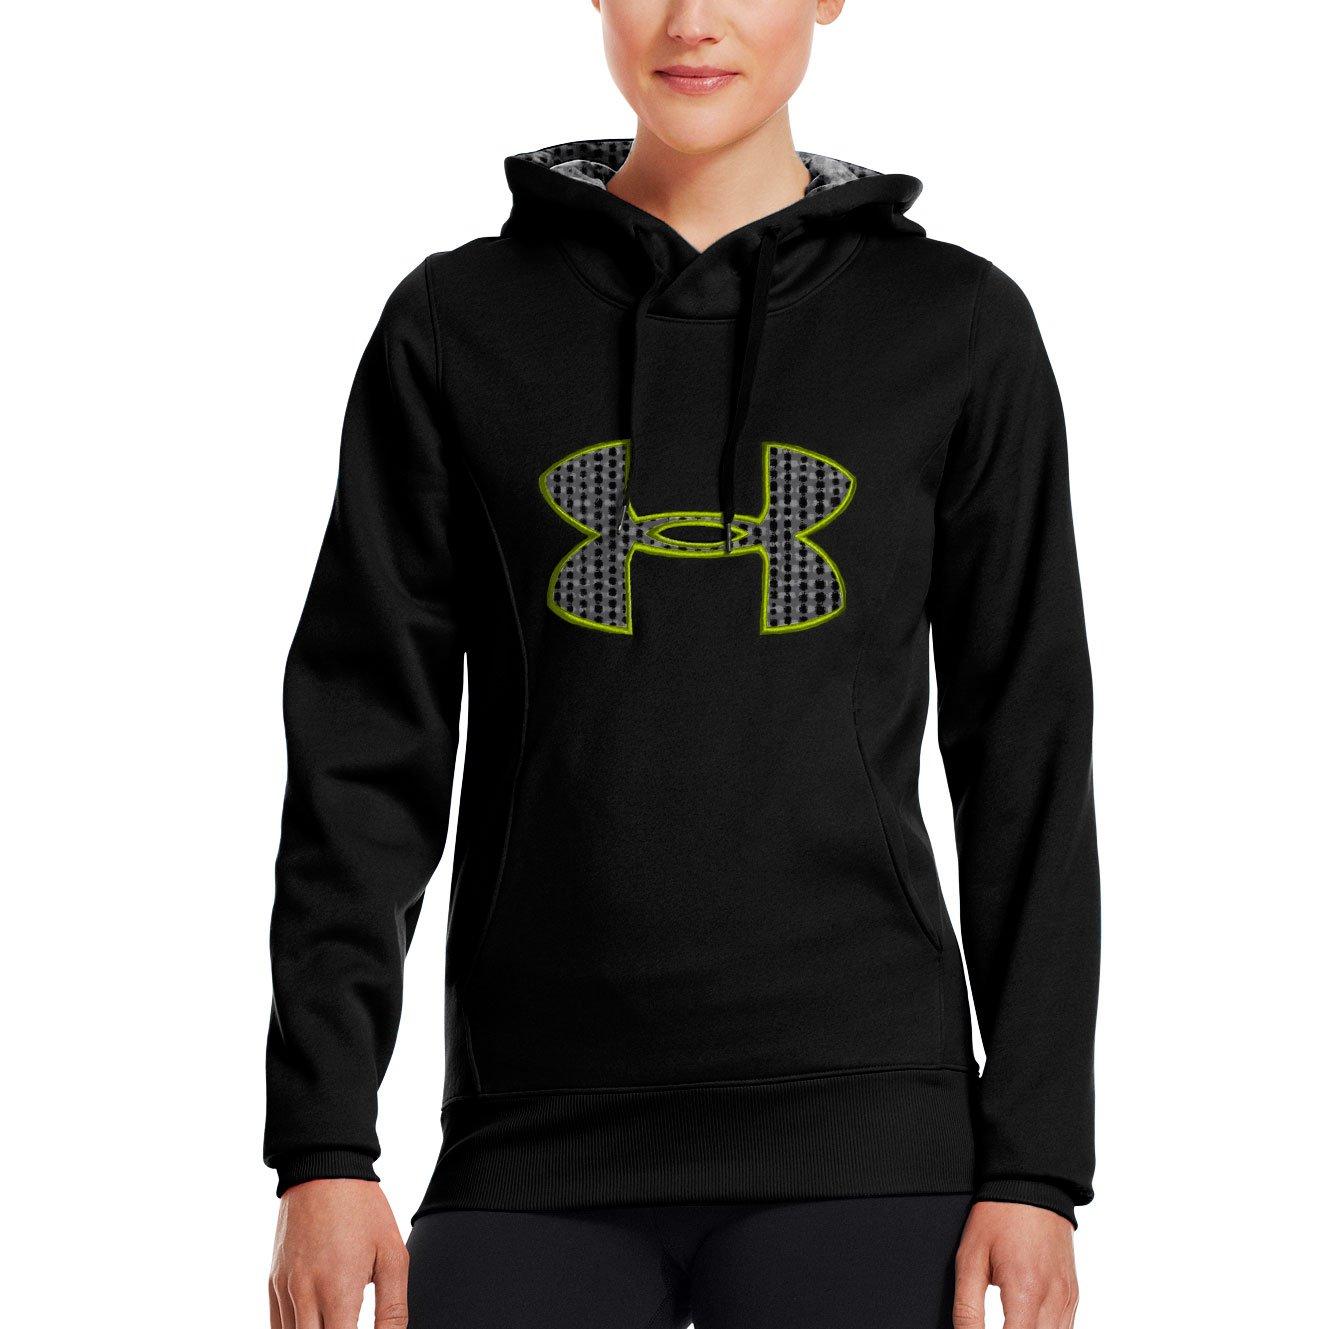 Under Armour Womens Fleece Storm Big Logo Hoody Black//Pinkadelic//Strobe